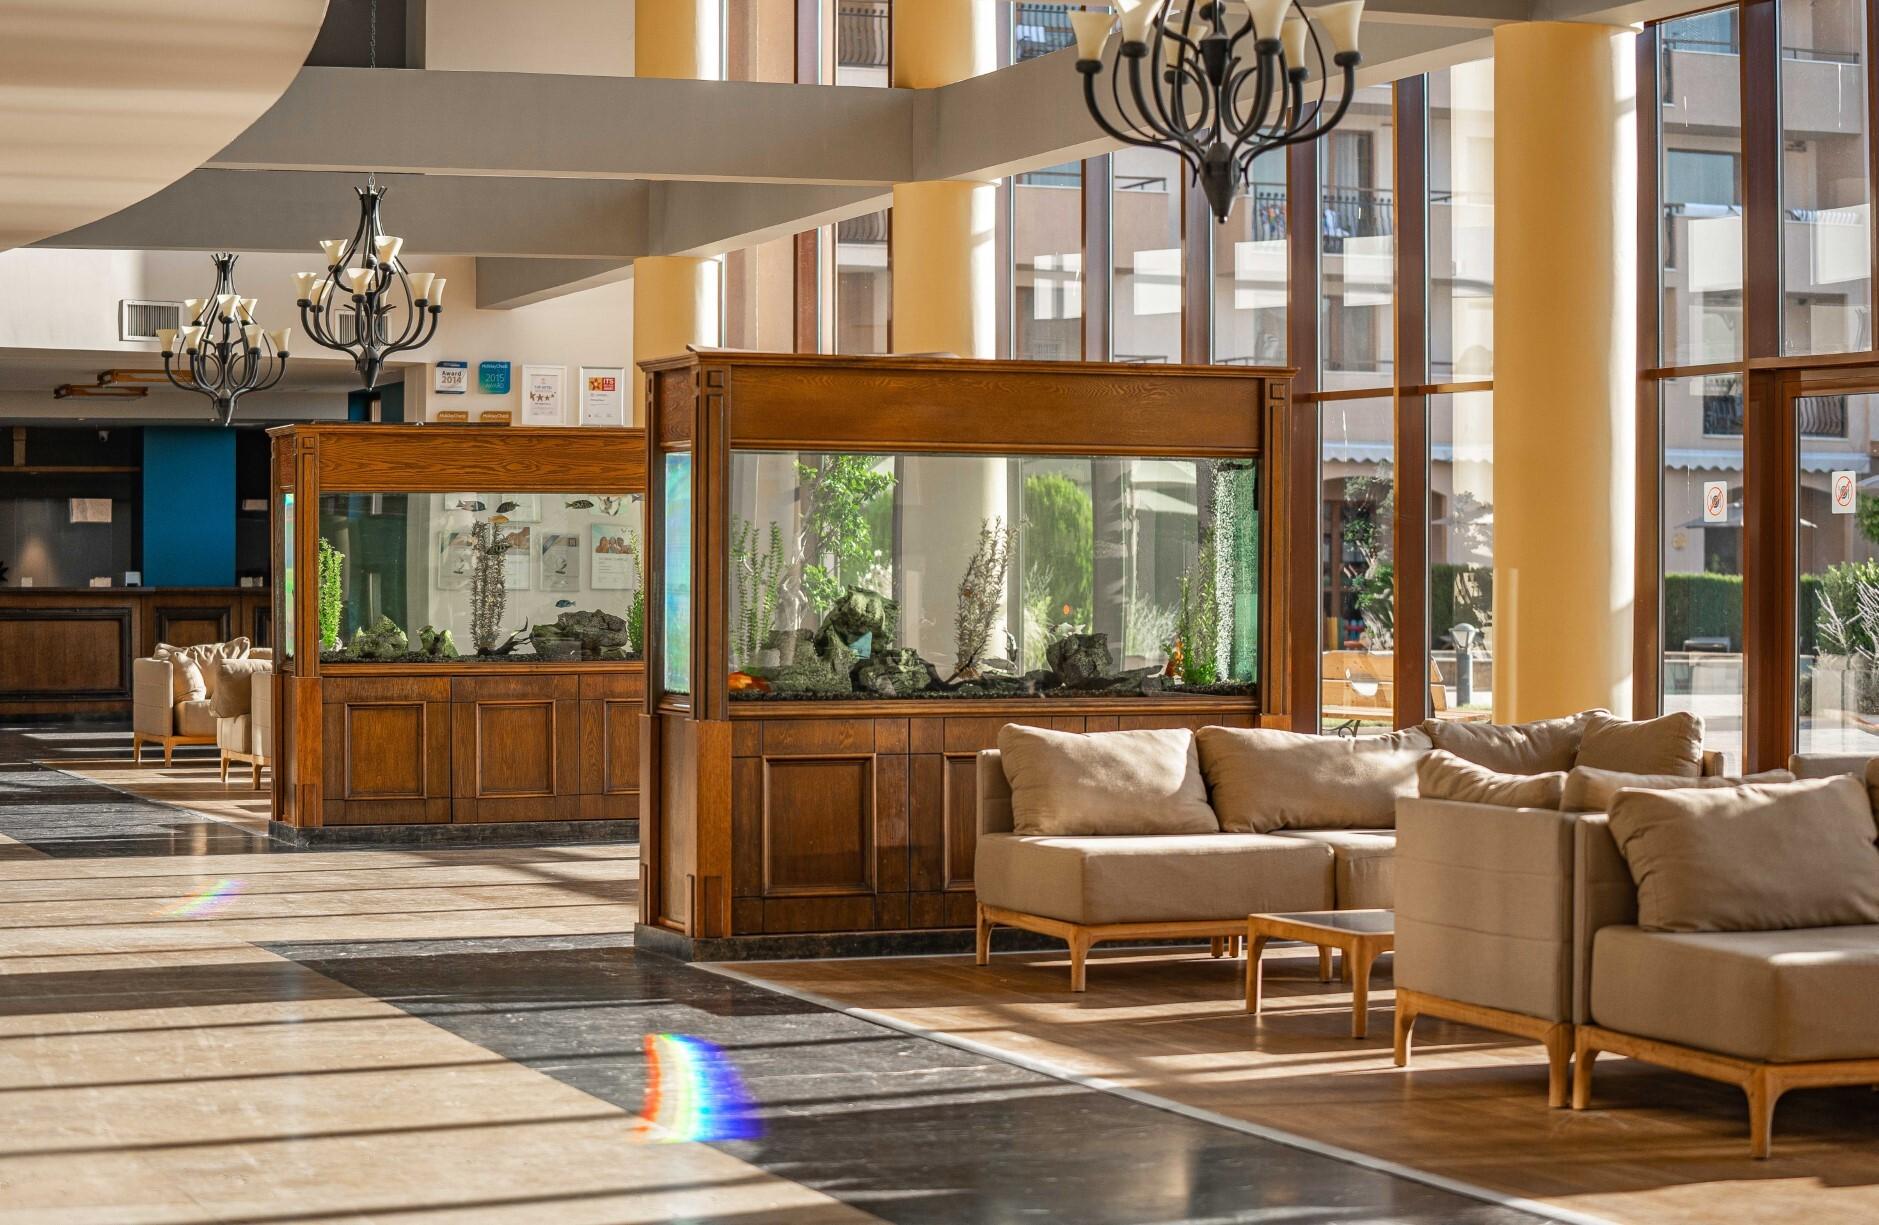 Хотел Мирамар 4* - рецепция